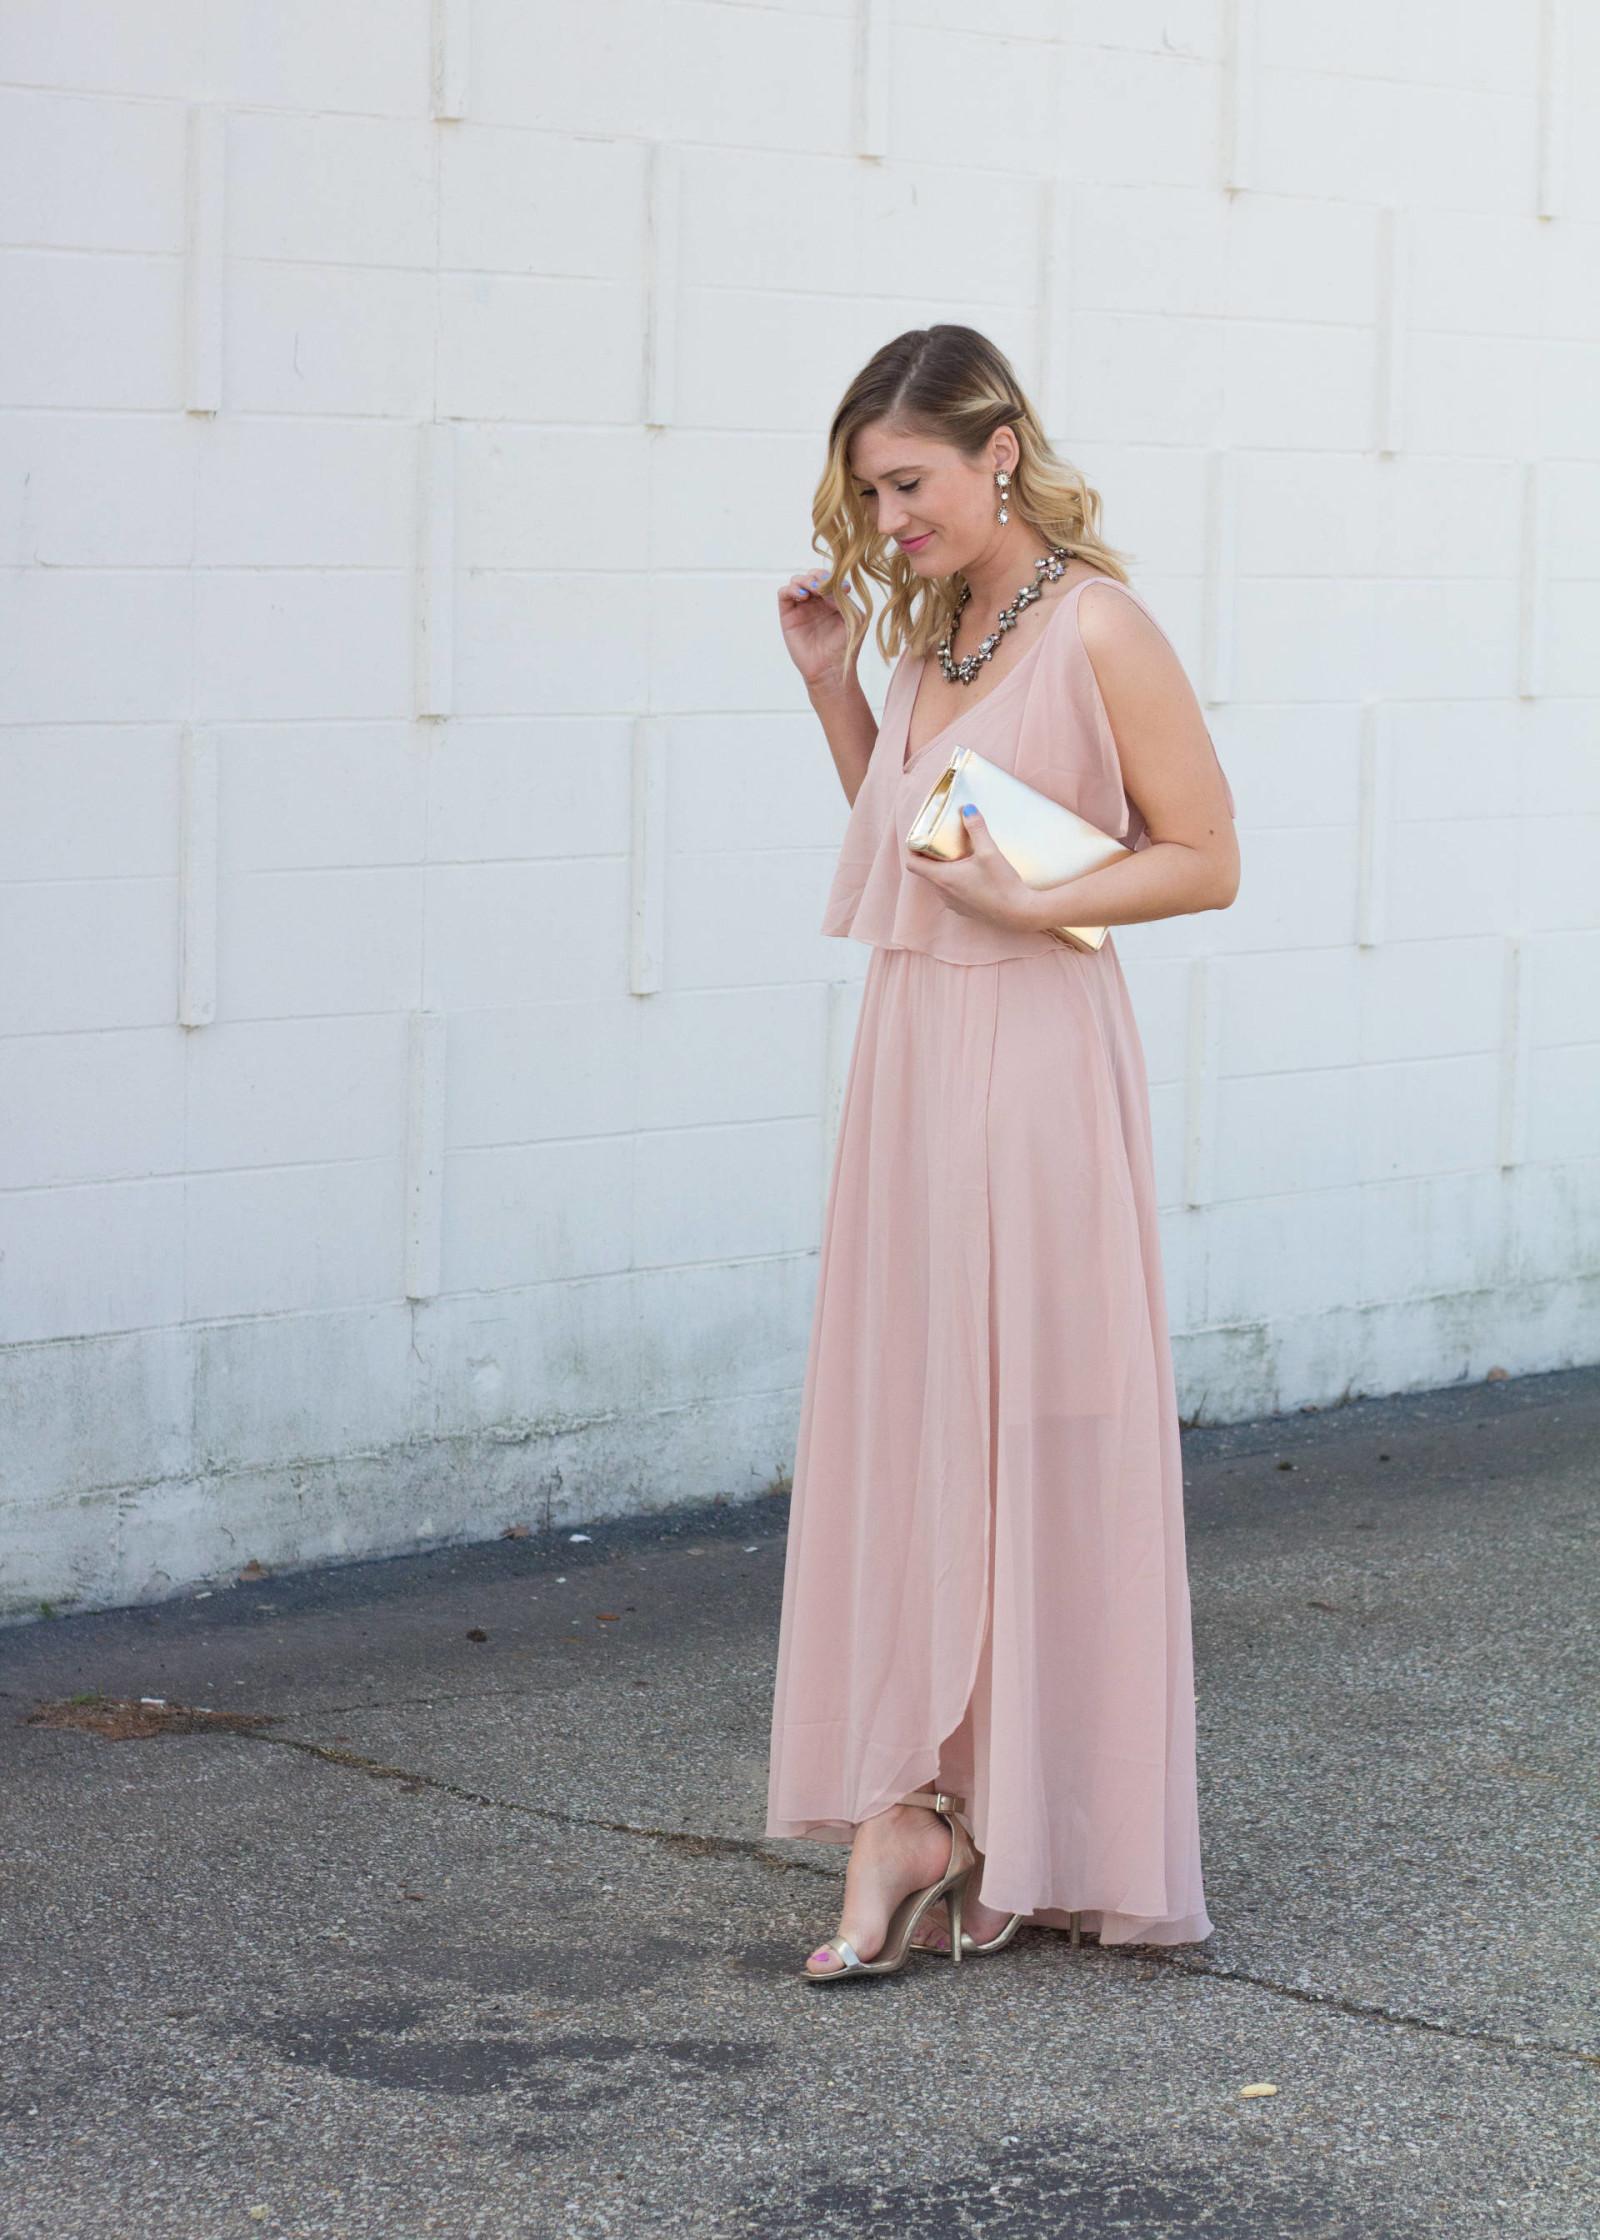 Spring Formal + Prom Inspiration - tons of picks under $75!   Gold-Hatted Lover